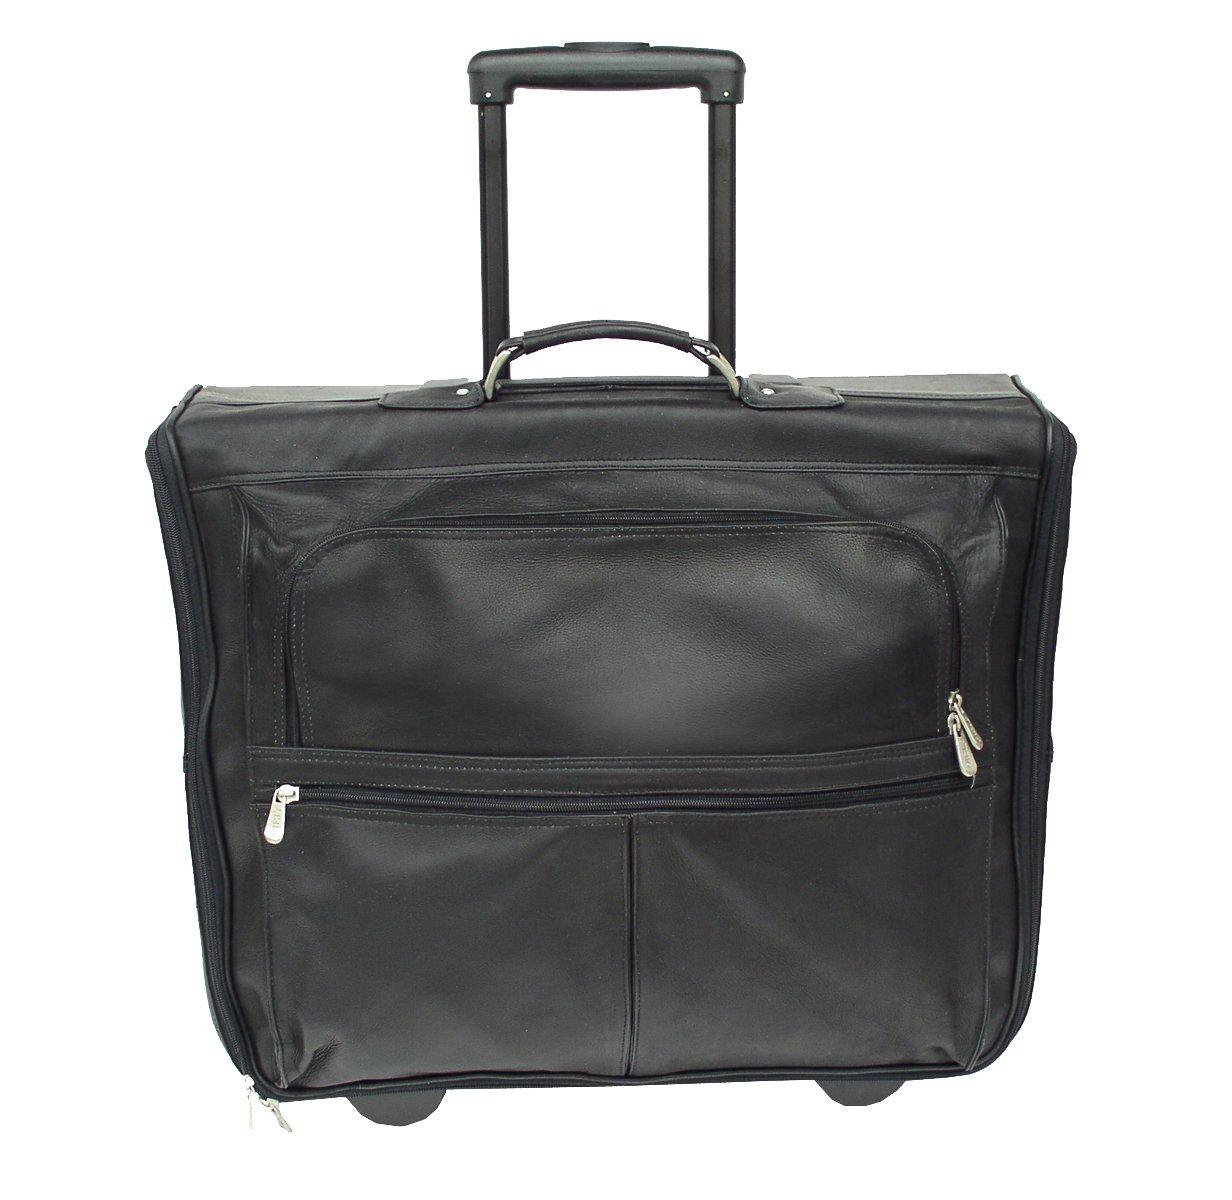 Piel Leather Traveler Garment Bag on Wheels in Black